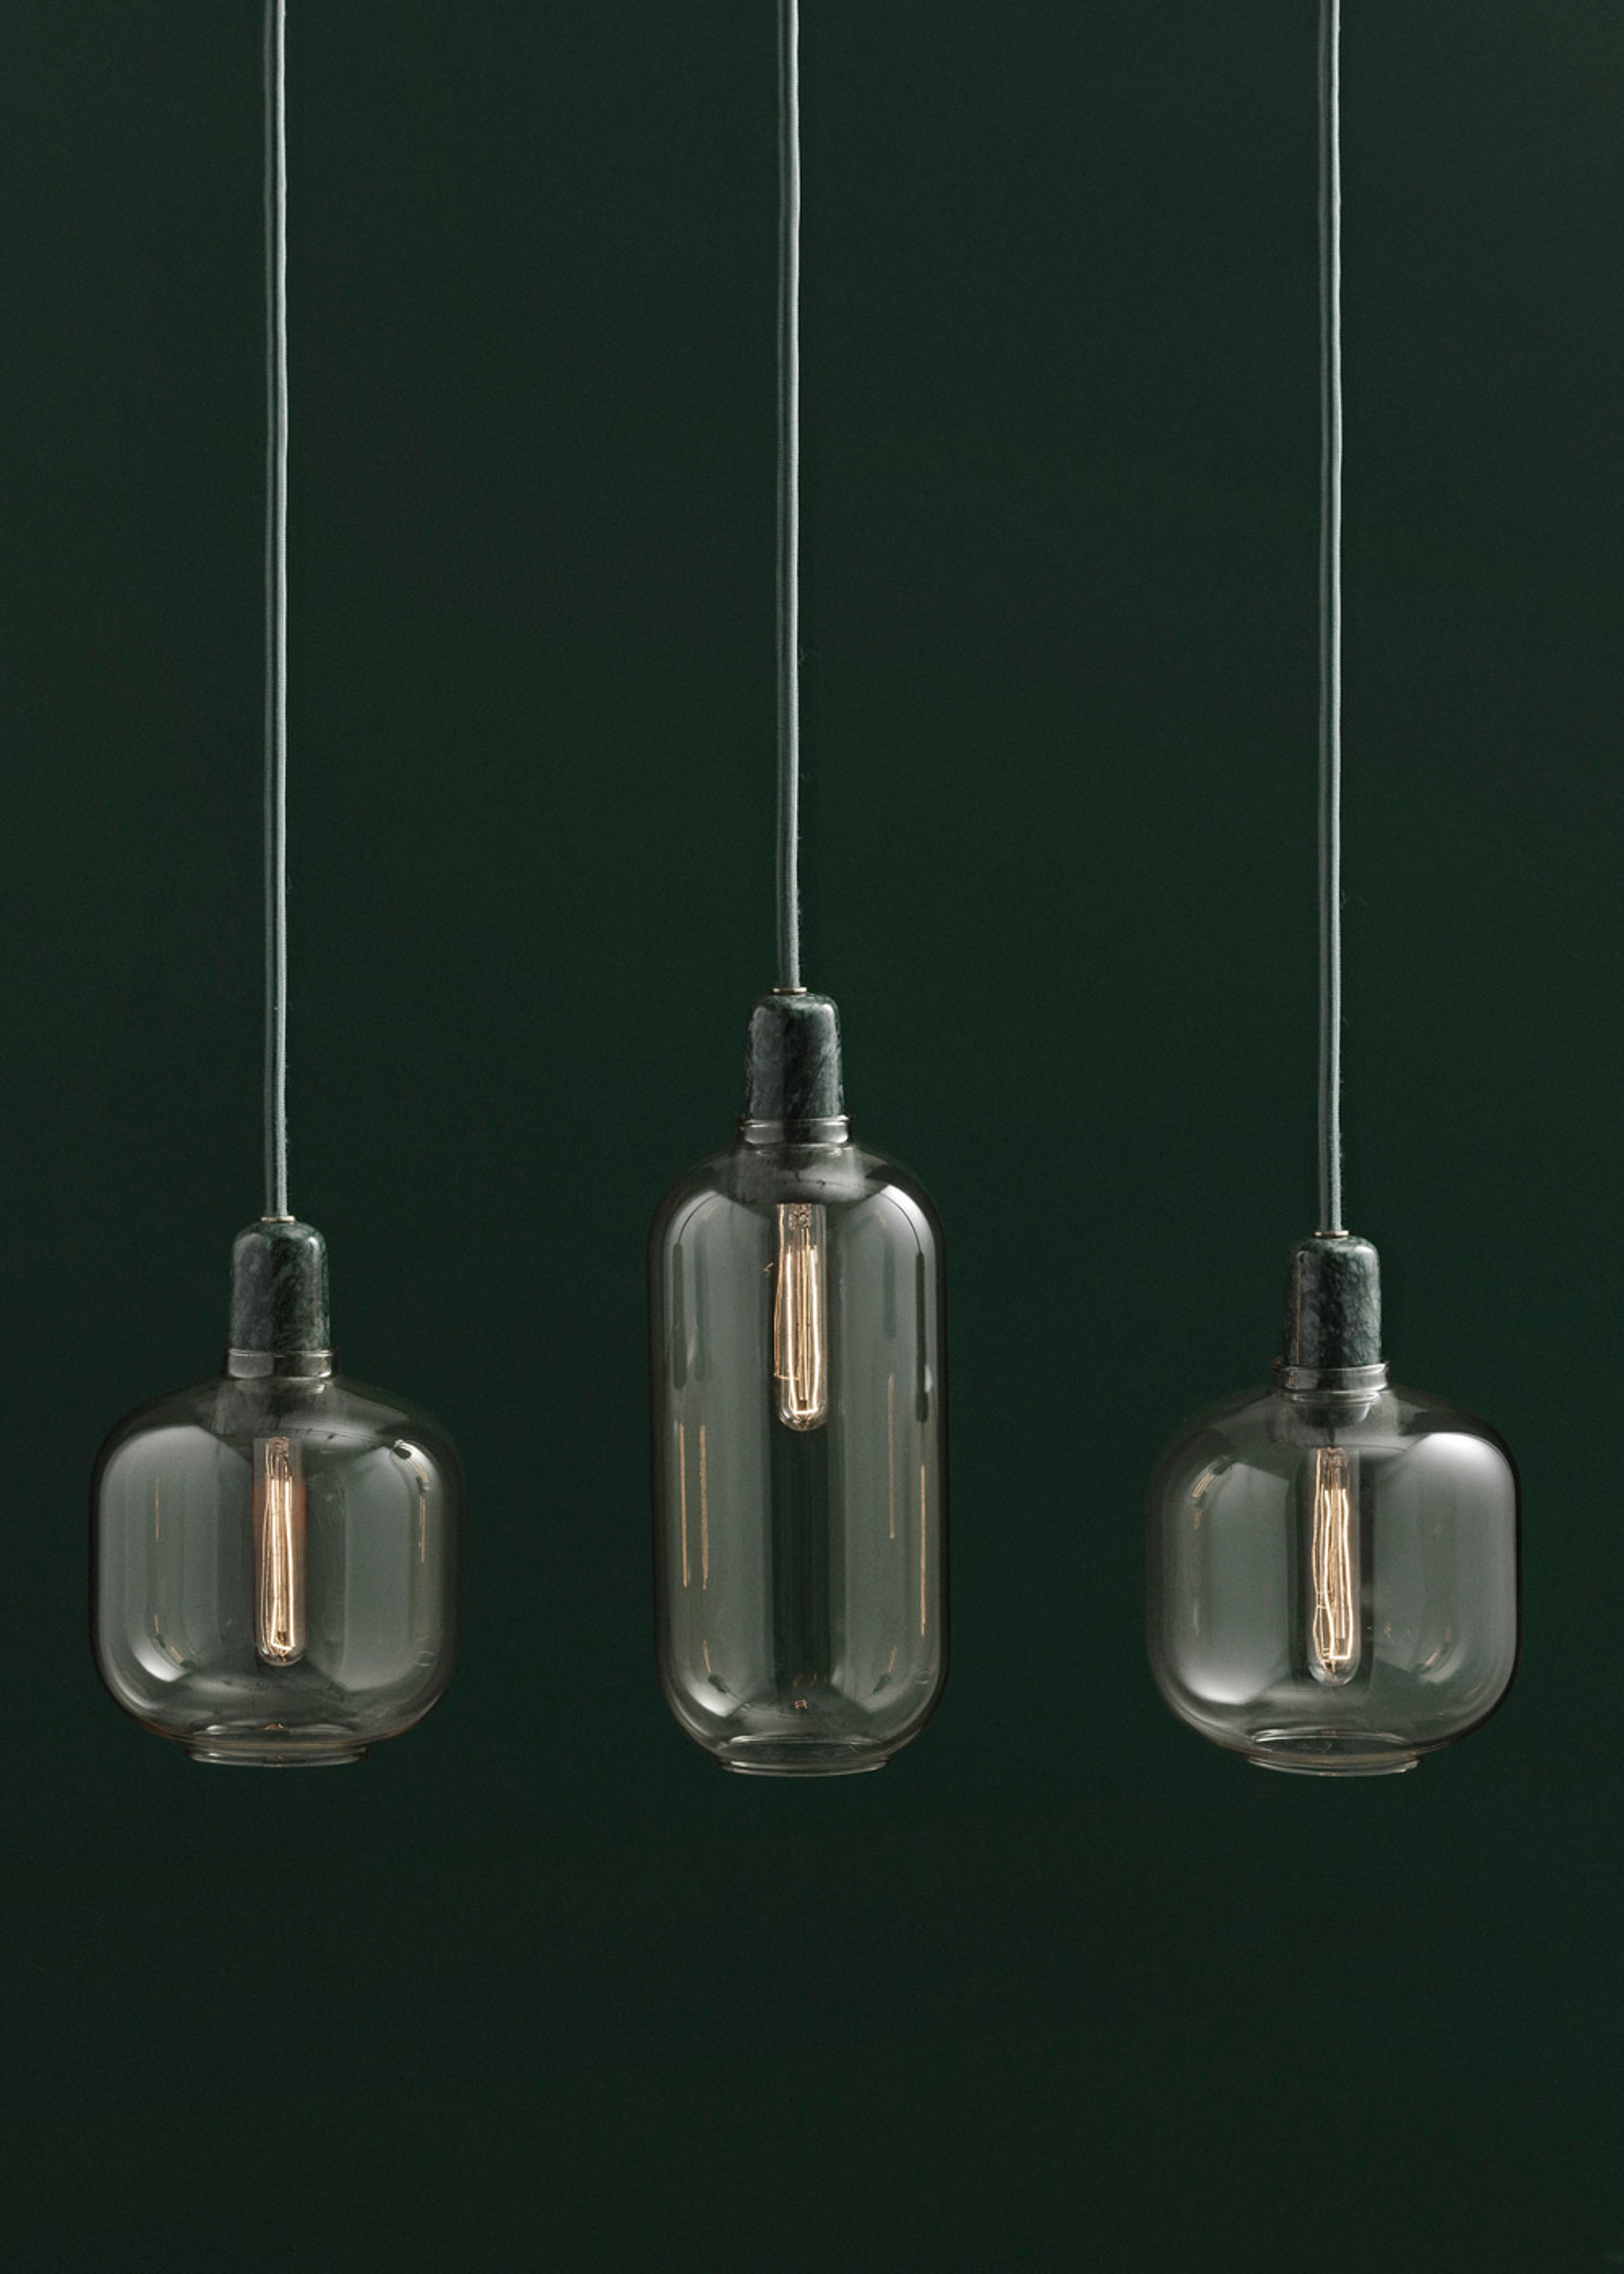 Normann Copenhagen Lampe : amp table lamp lampe normann copenhagen ~ Watch28wear.com Haus und Dekorationen